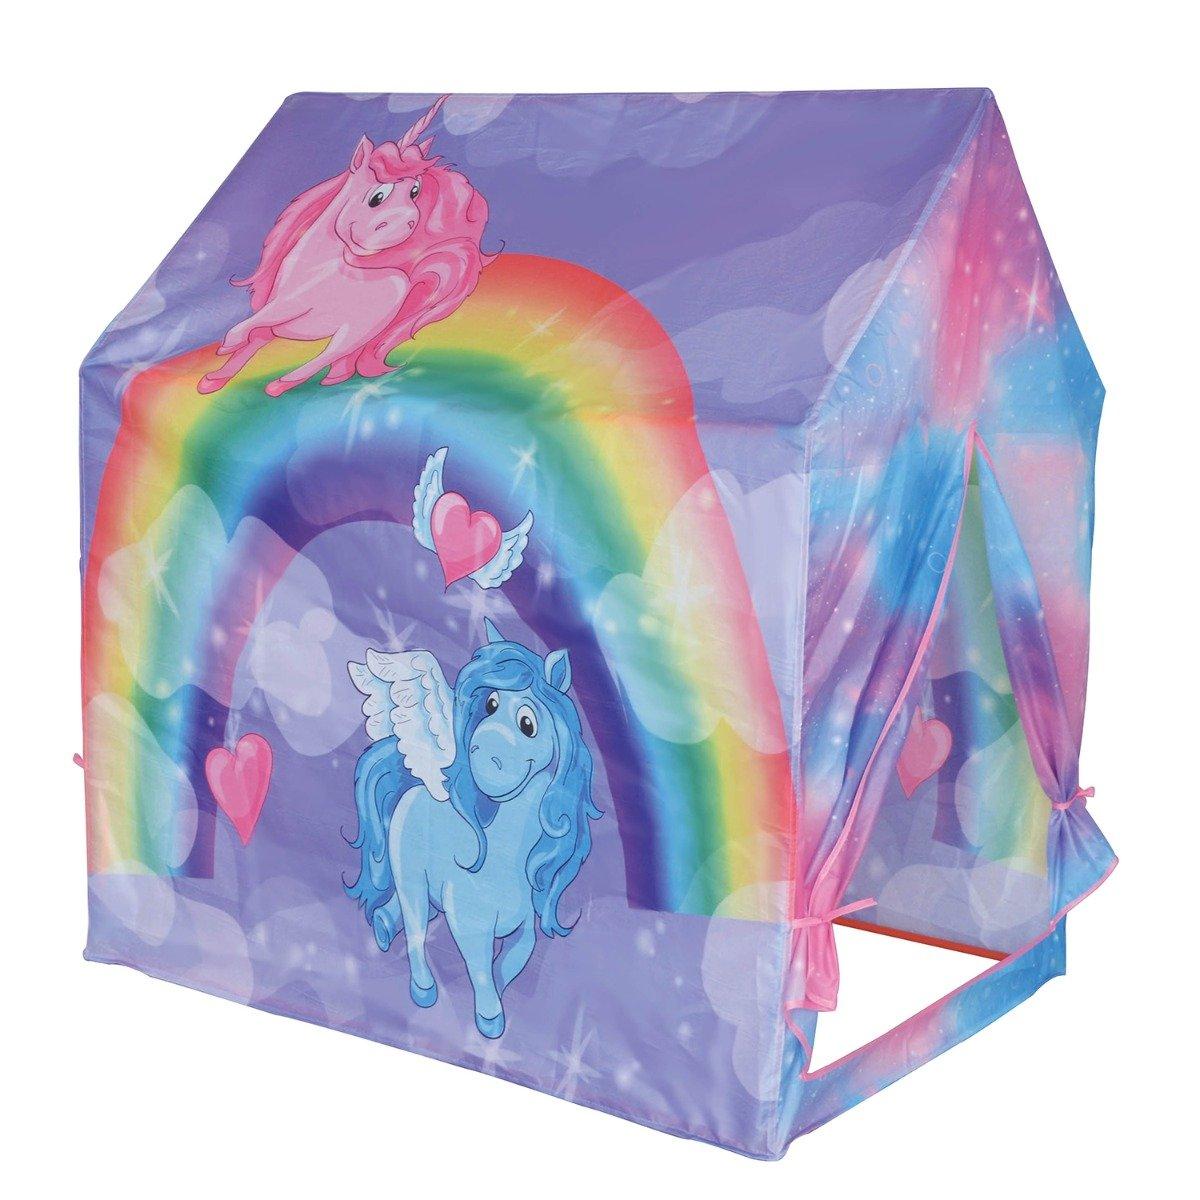 Cort pentru copii Iplay-Toys Unicorn House Tent